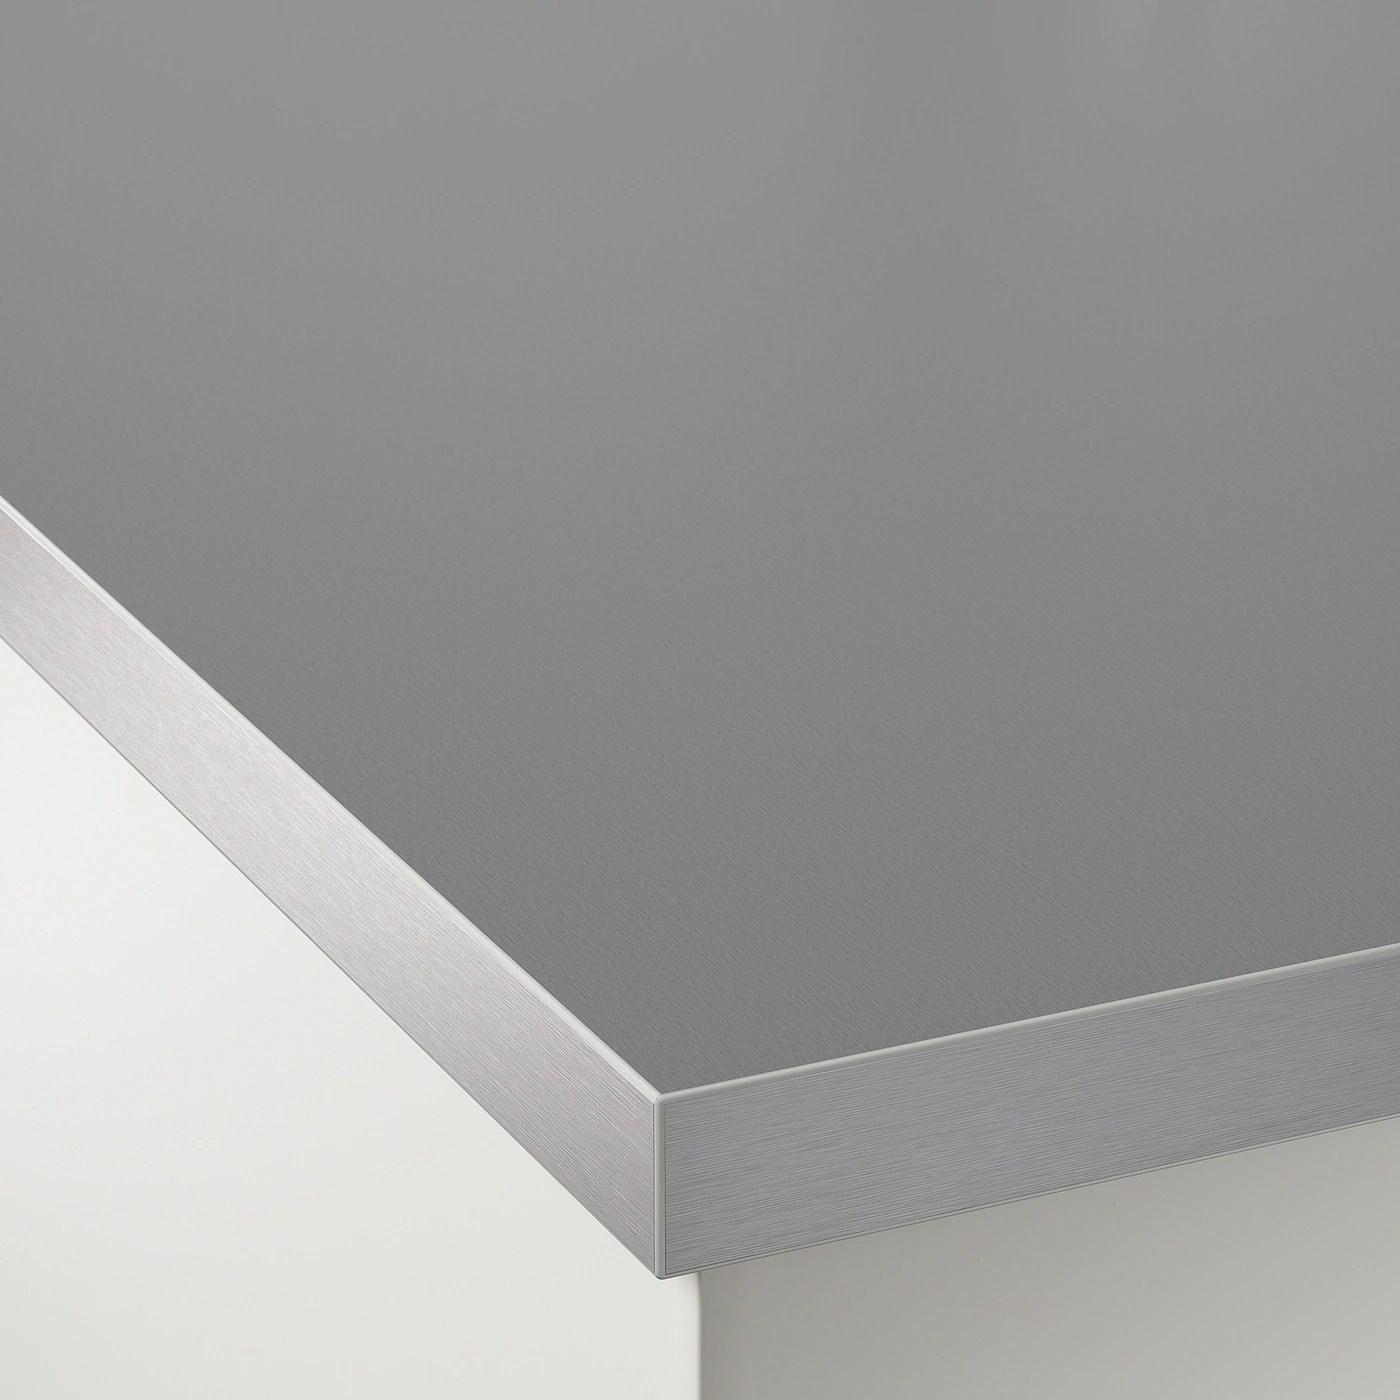 Hallestad Plan De Travail Double Face Blanc Motif Aluminium Motif Aluminium Chant Effet Metal Av Chant Effet Metal Stratifie 246x3 Ikea